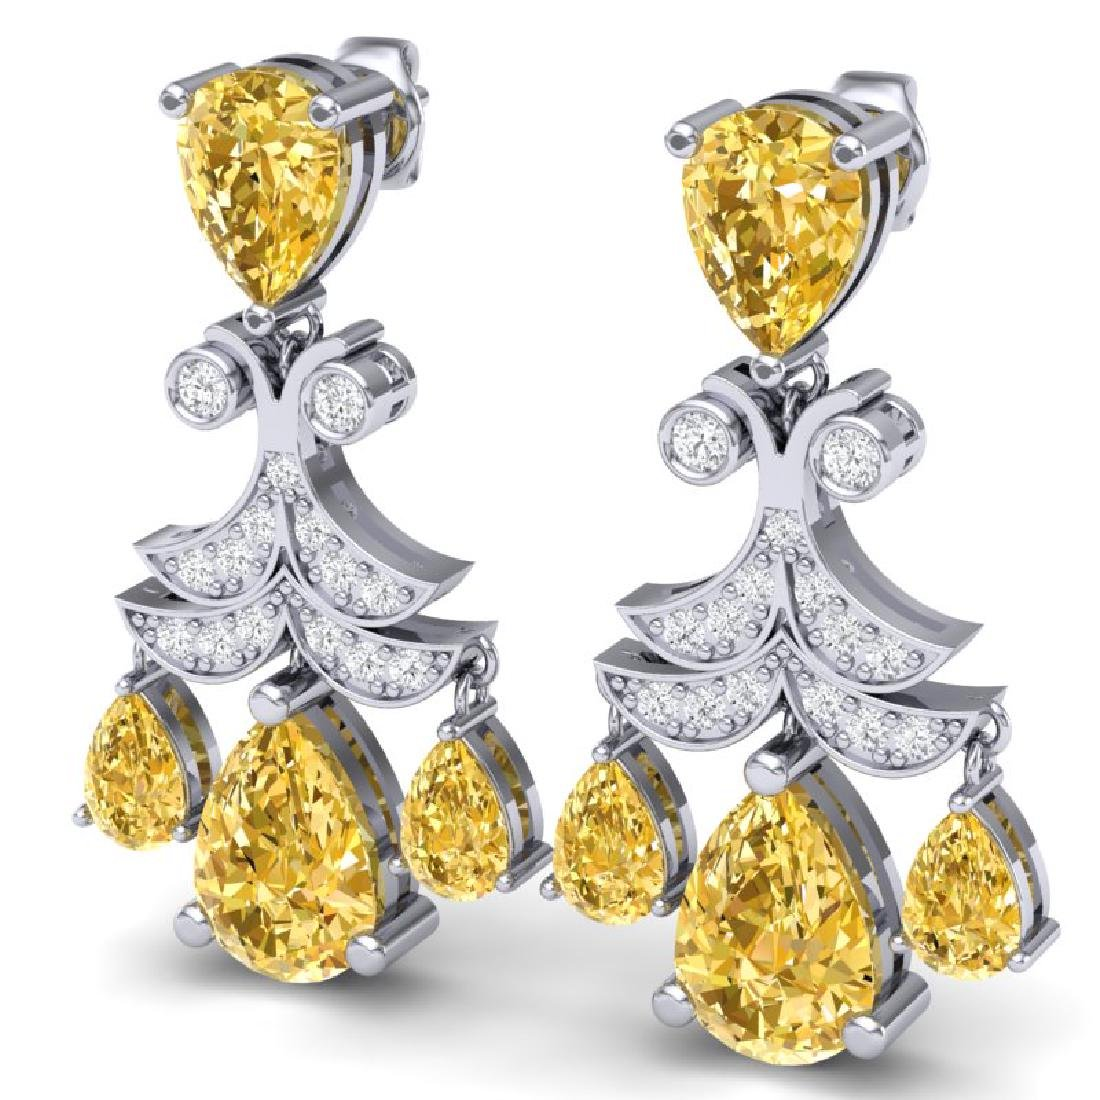 10.41 CTW Royalty Canary Citrine & VS Diamond Earrings - 2